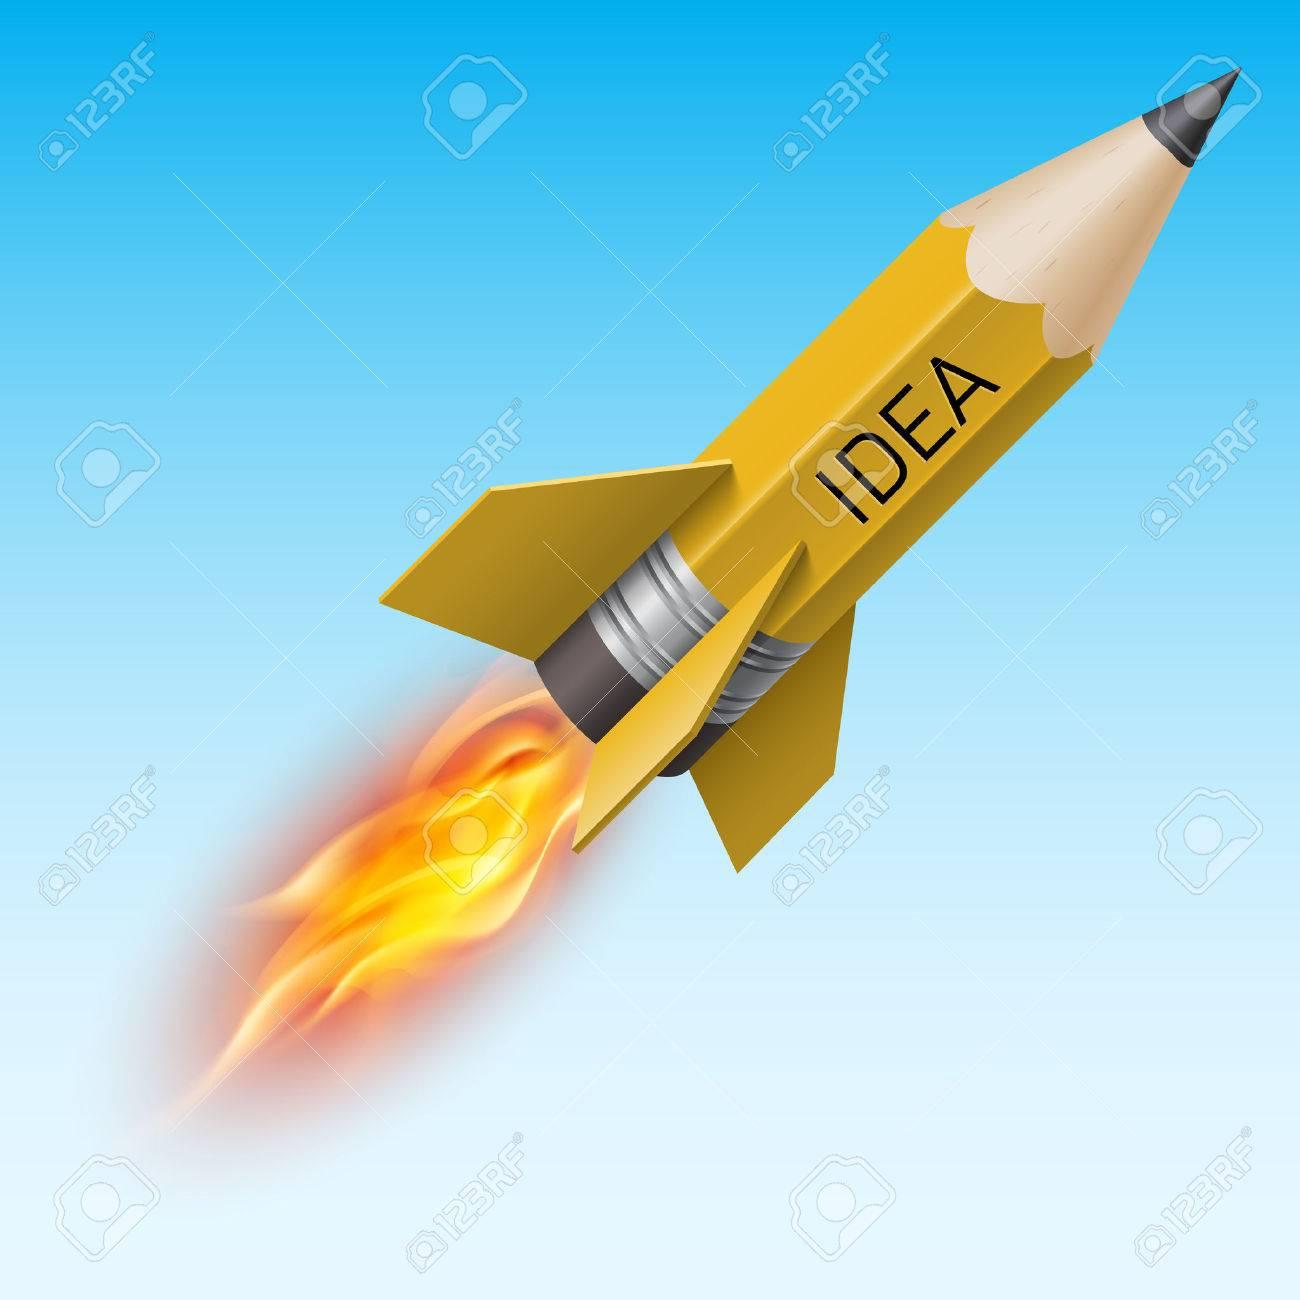 Creative design concept with yellow pencil as flying rocket Stock Vector - 37433365